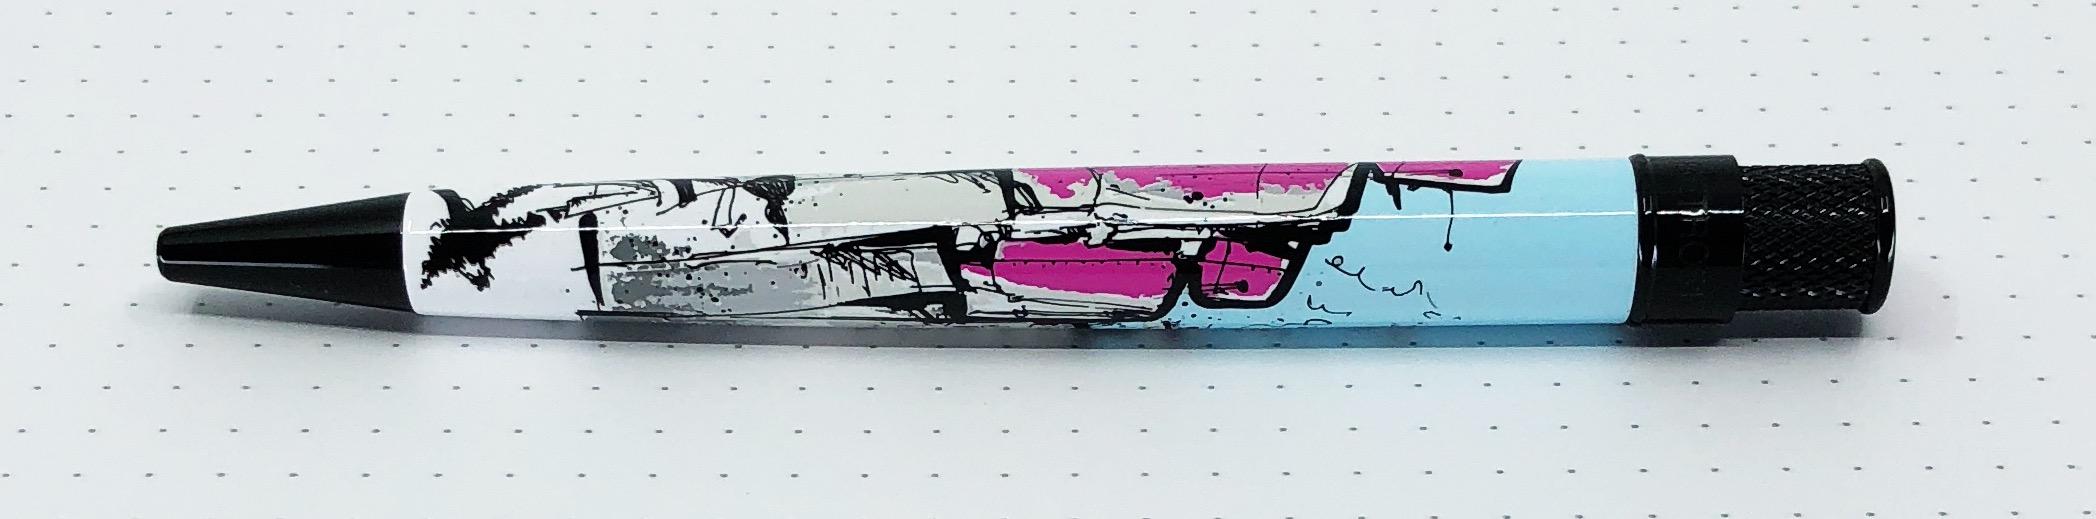 Pen Addict Retro 51 Pink Robots Side